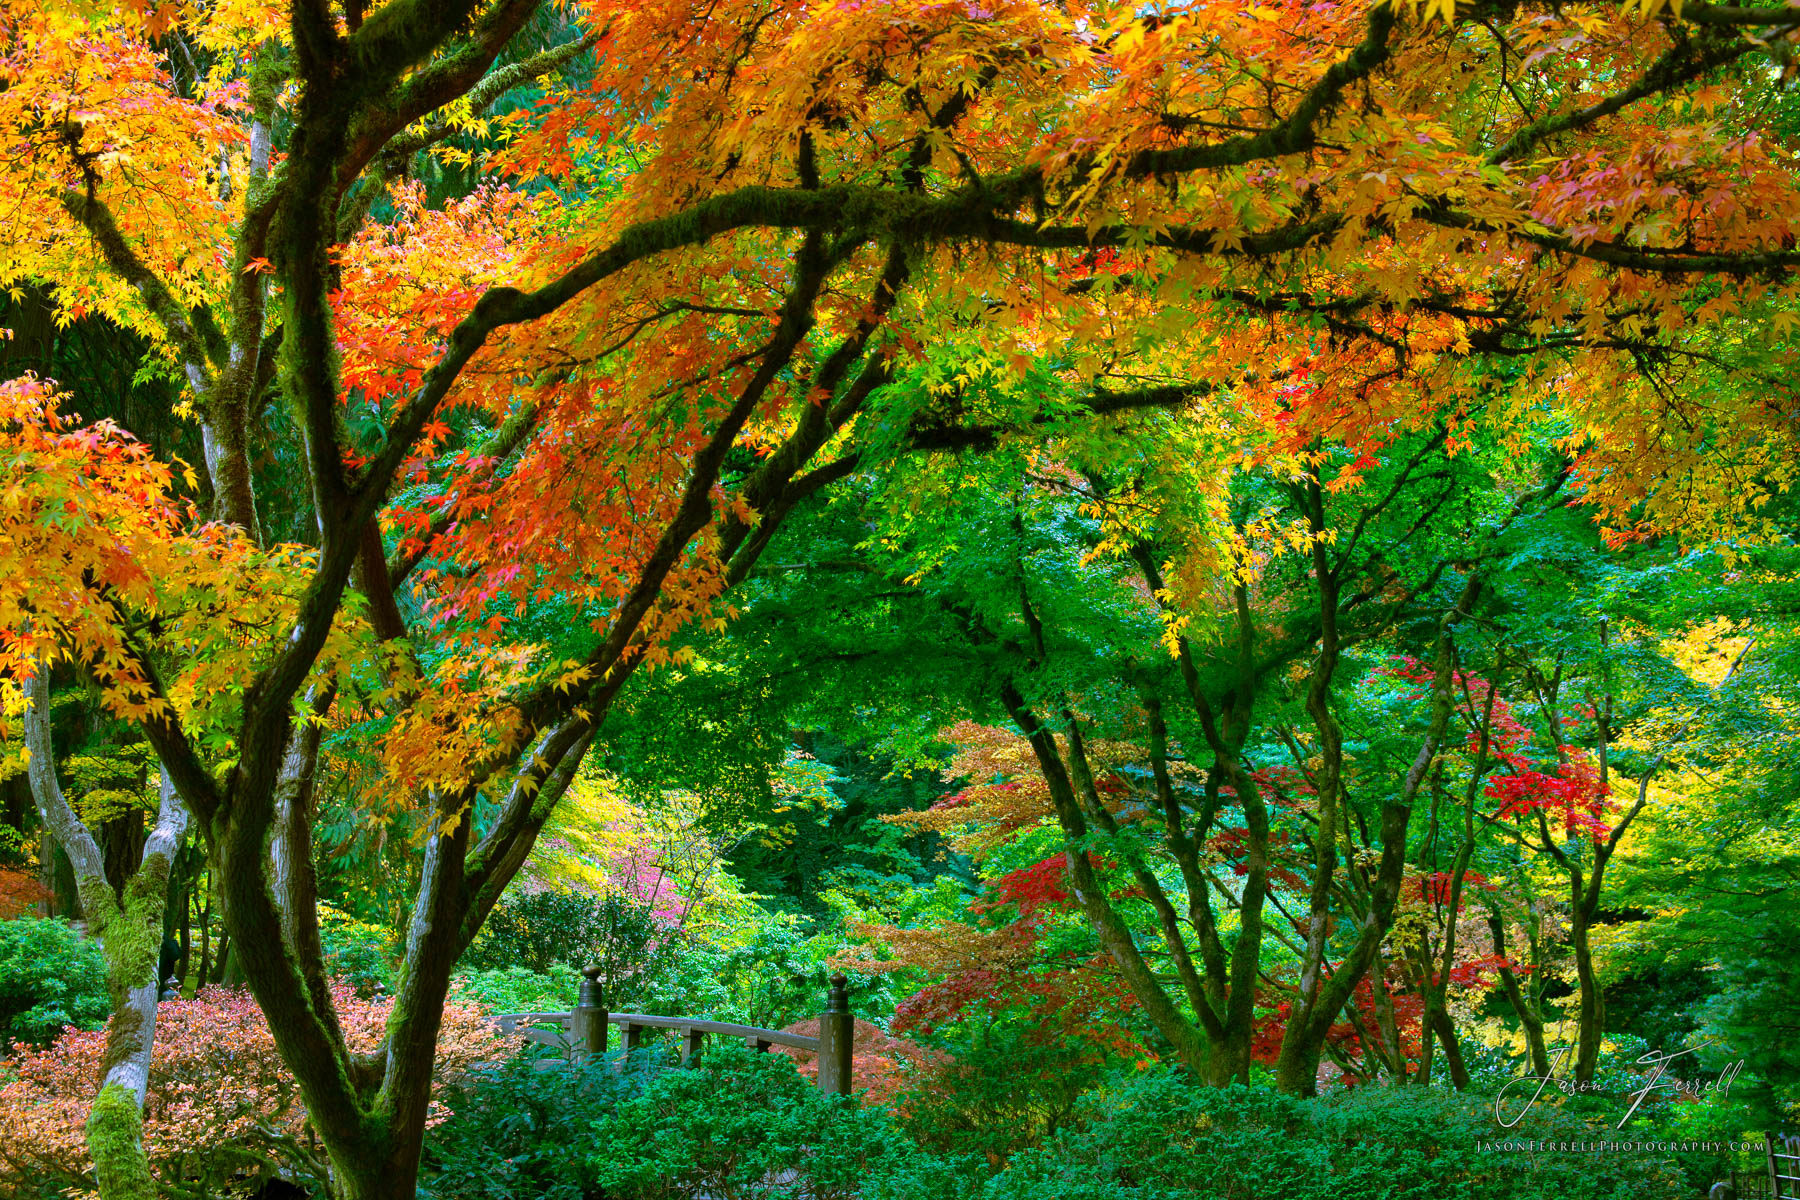 kaleidoscope, portland japanese garden, trees, fall, autumn, foilage, photo